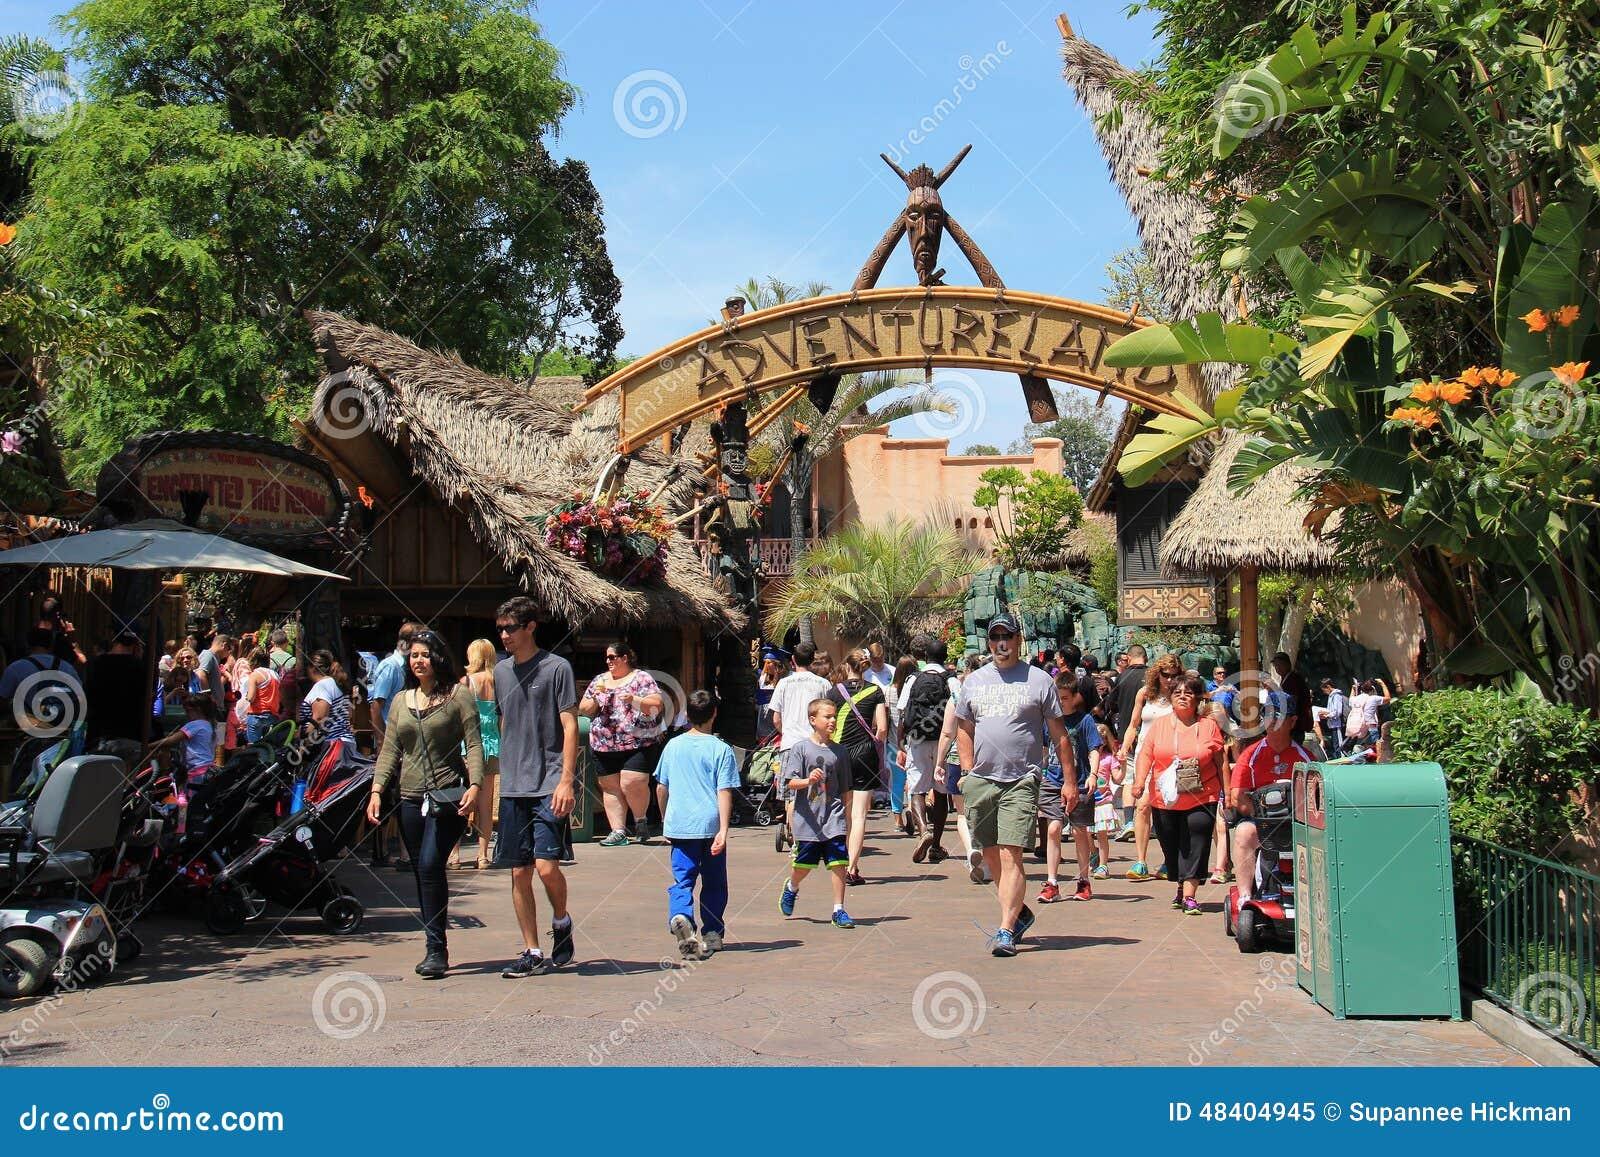 Adventureland At Disneyland Editorial Image Image Of